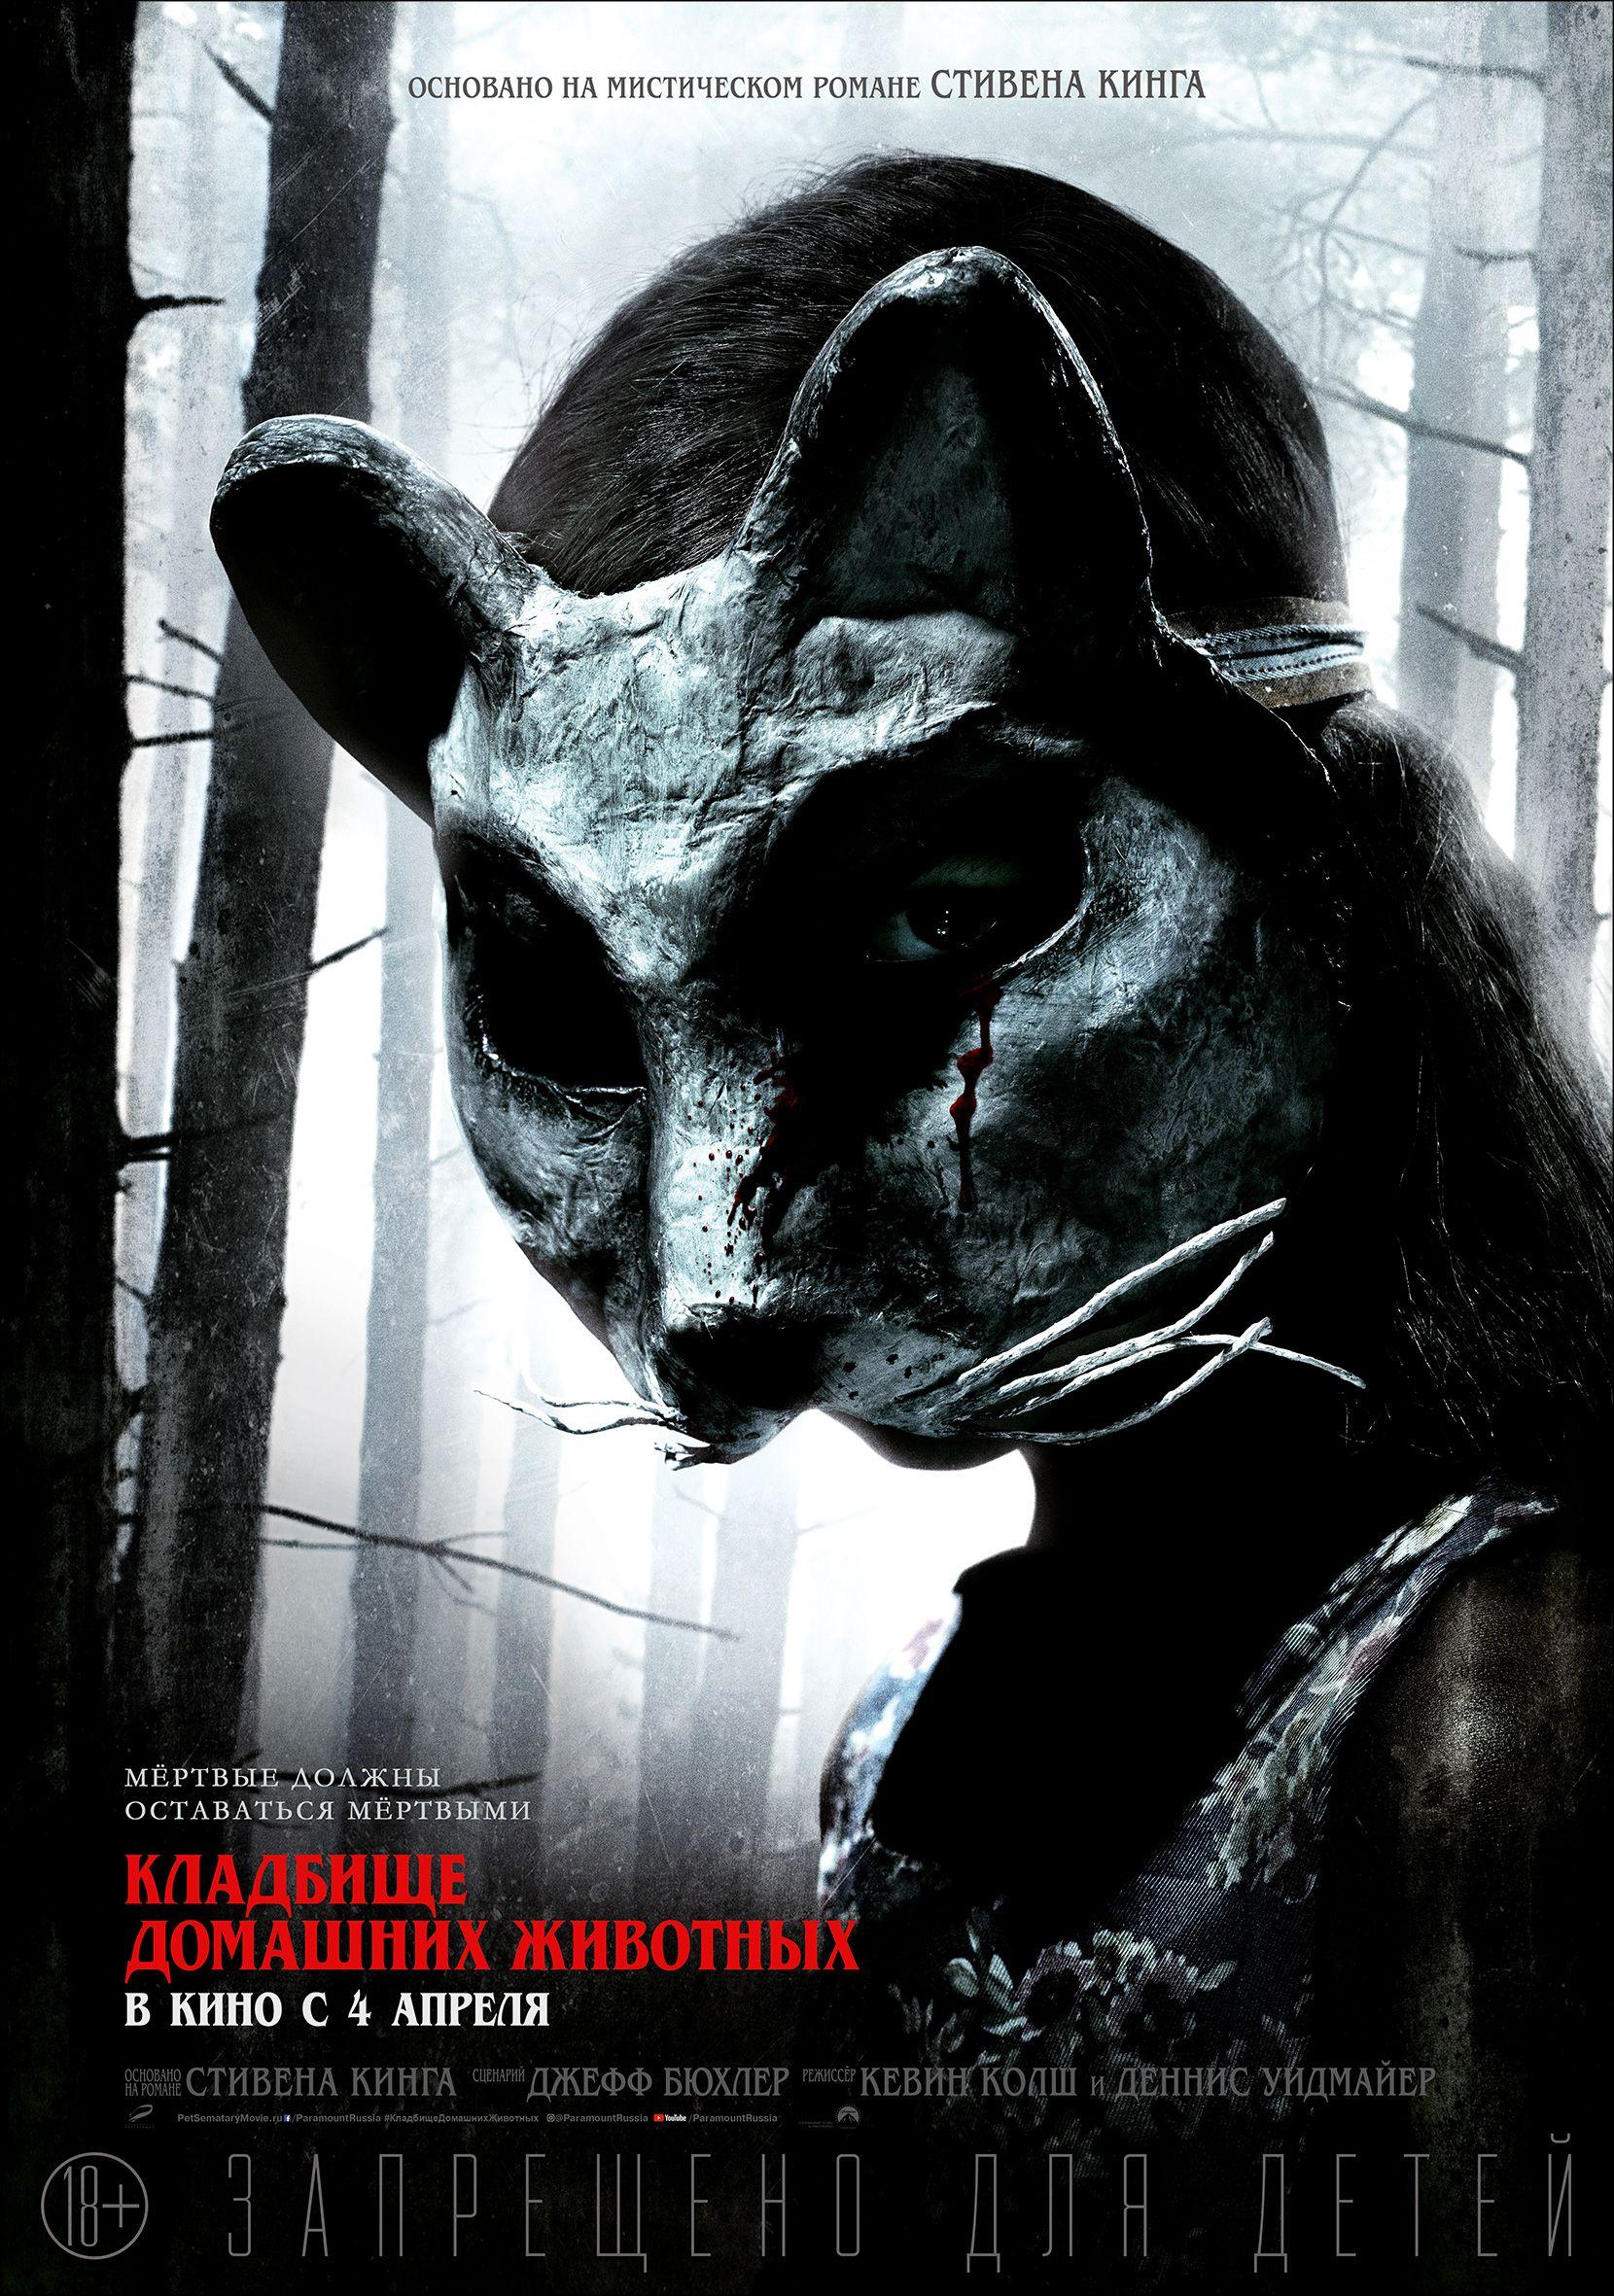 Pet Sematary New Film Posters Https Teaser Trailer Com Movie Pet Sematary Petsematary Petsema Cementerio De Animales Películas Completas Ver Películas